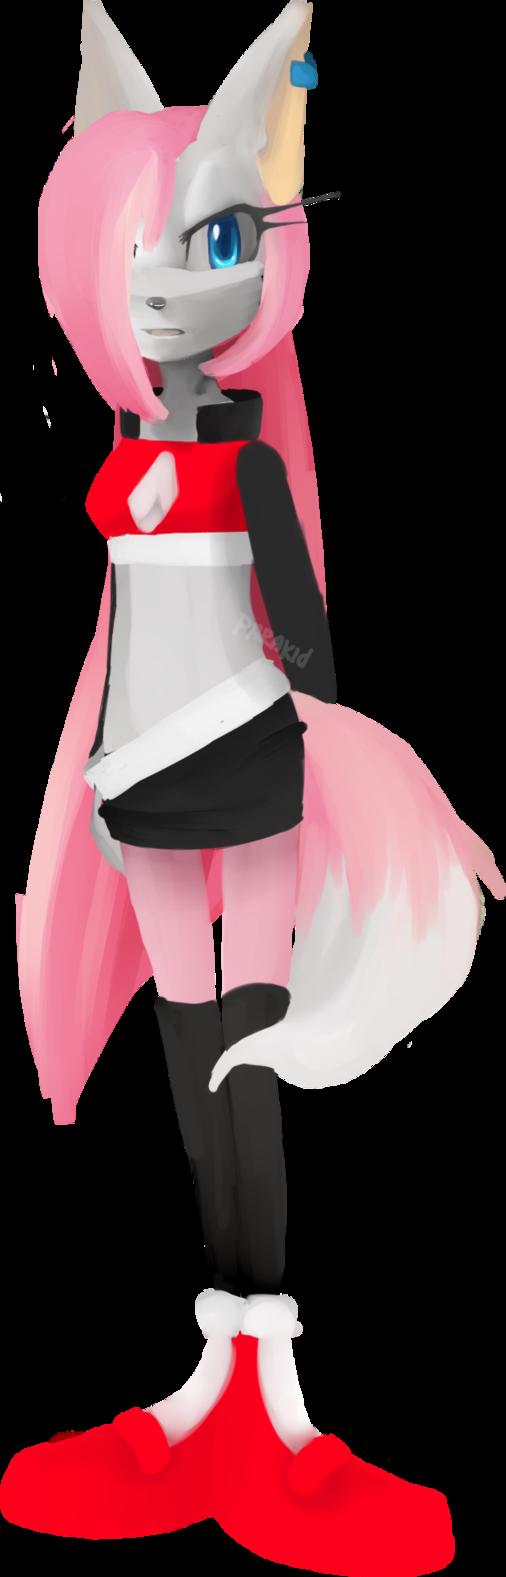 Cherry the fox by Coffee-Karin